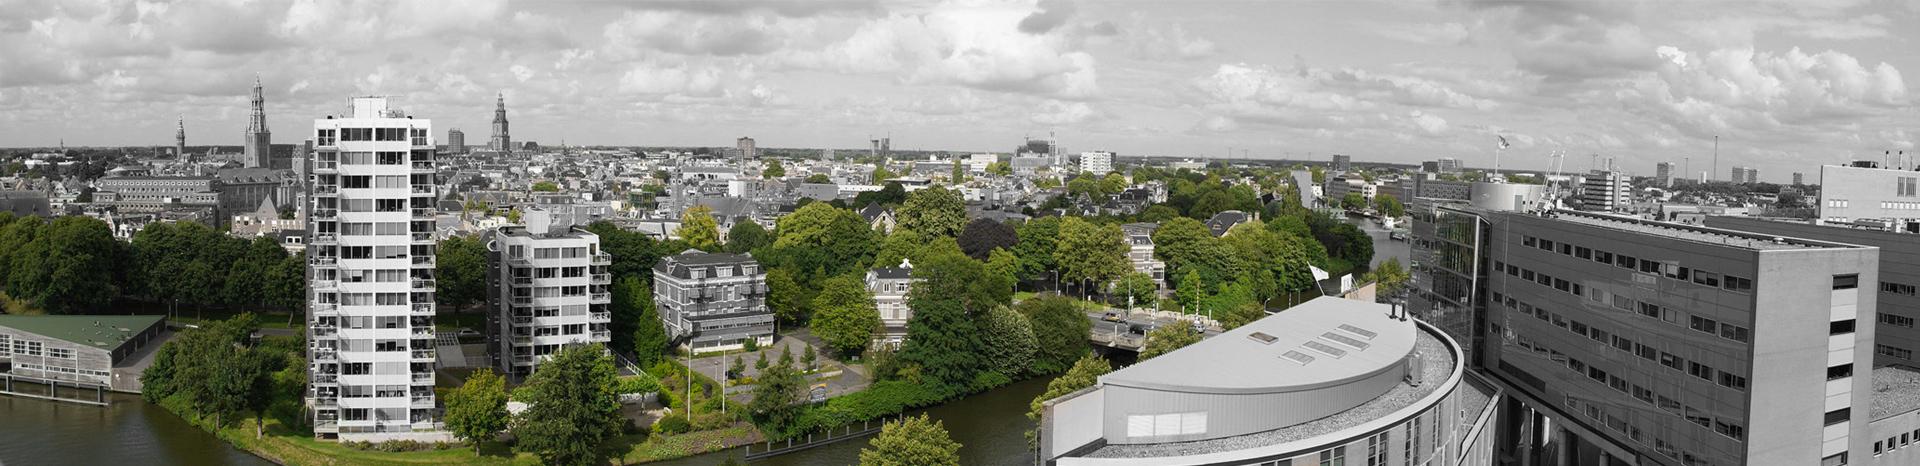 Letselschade advocaat Groningen | LetselPro